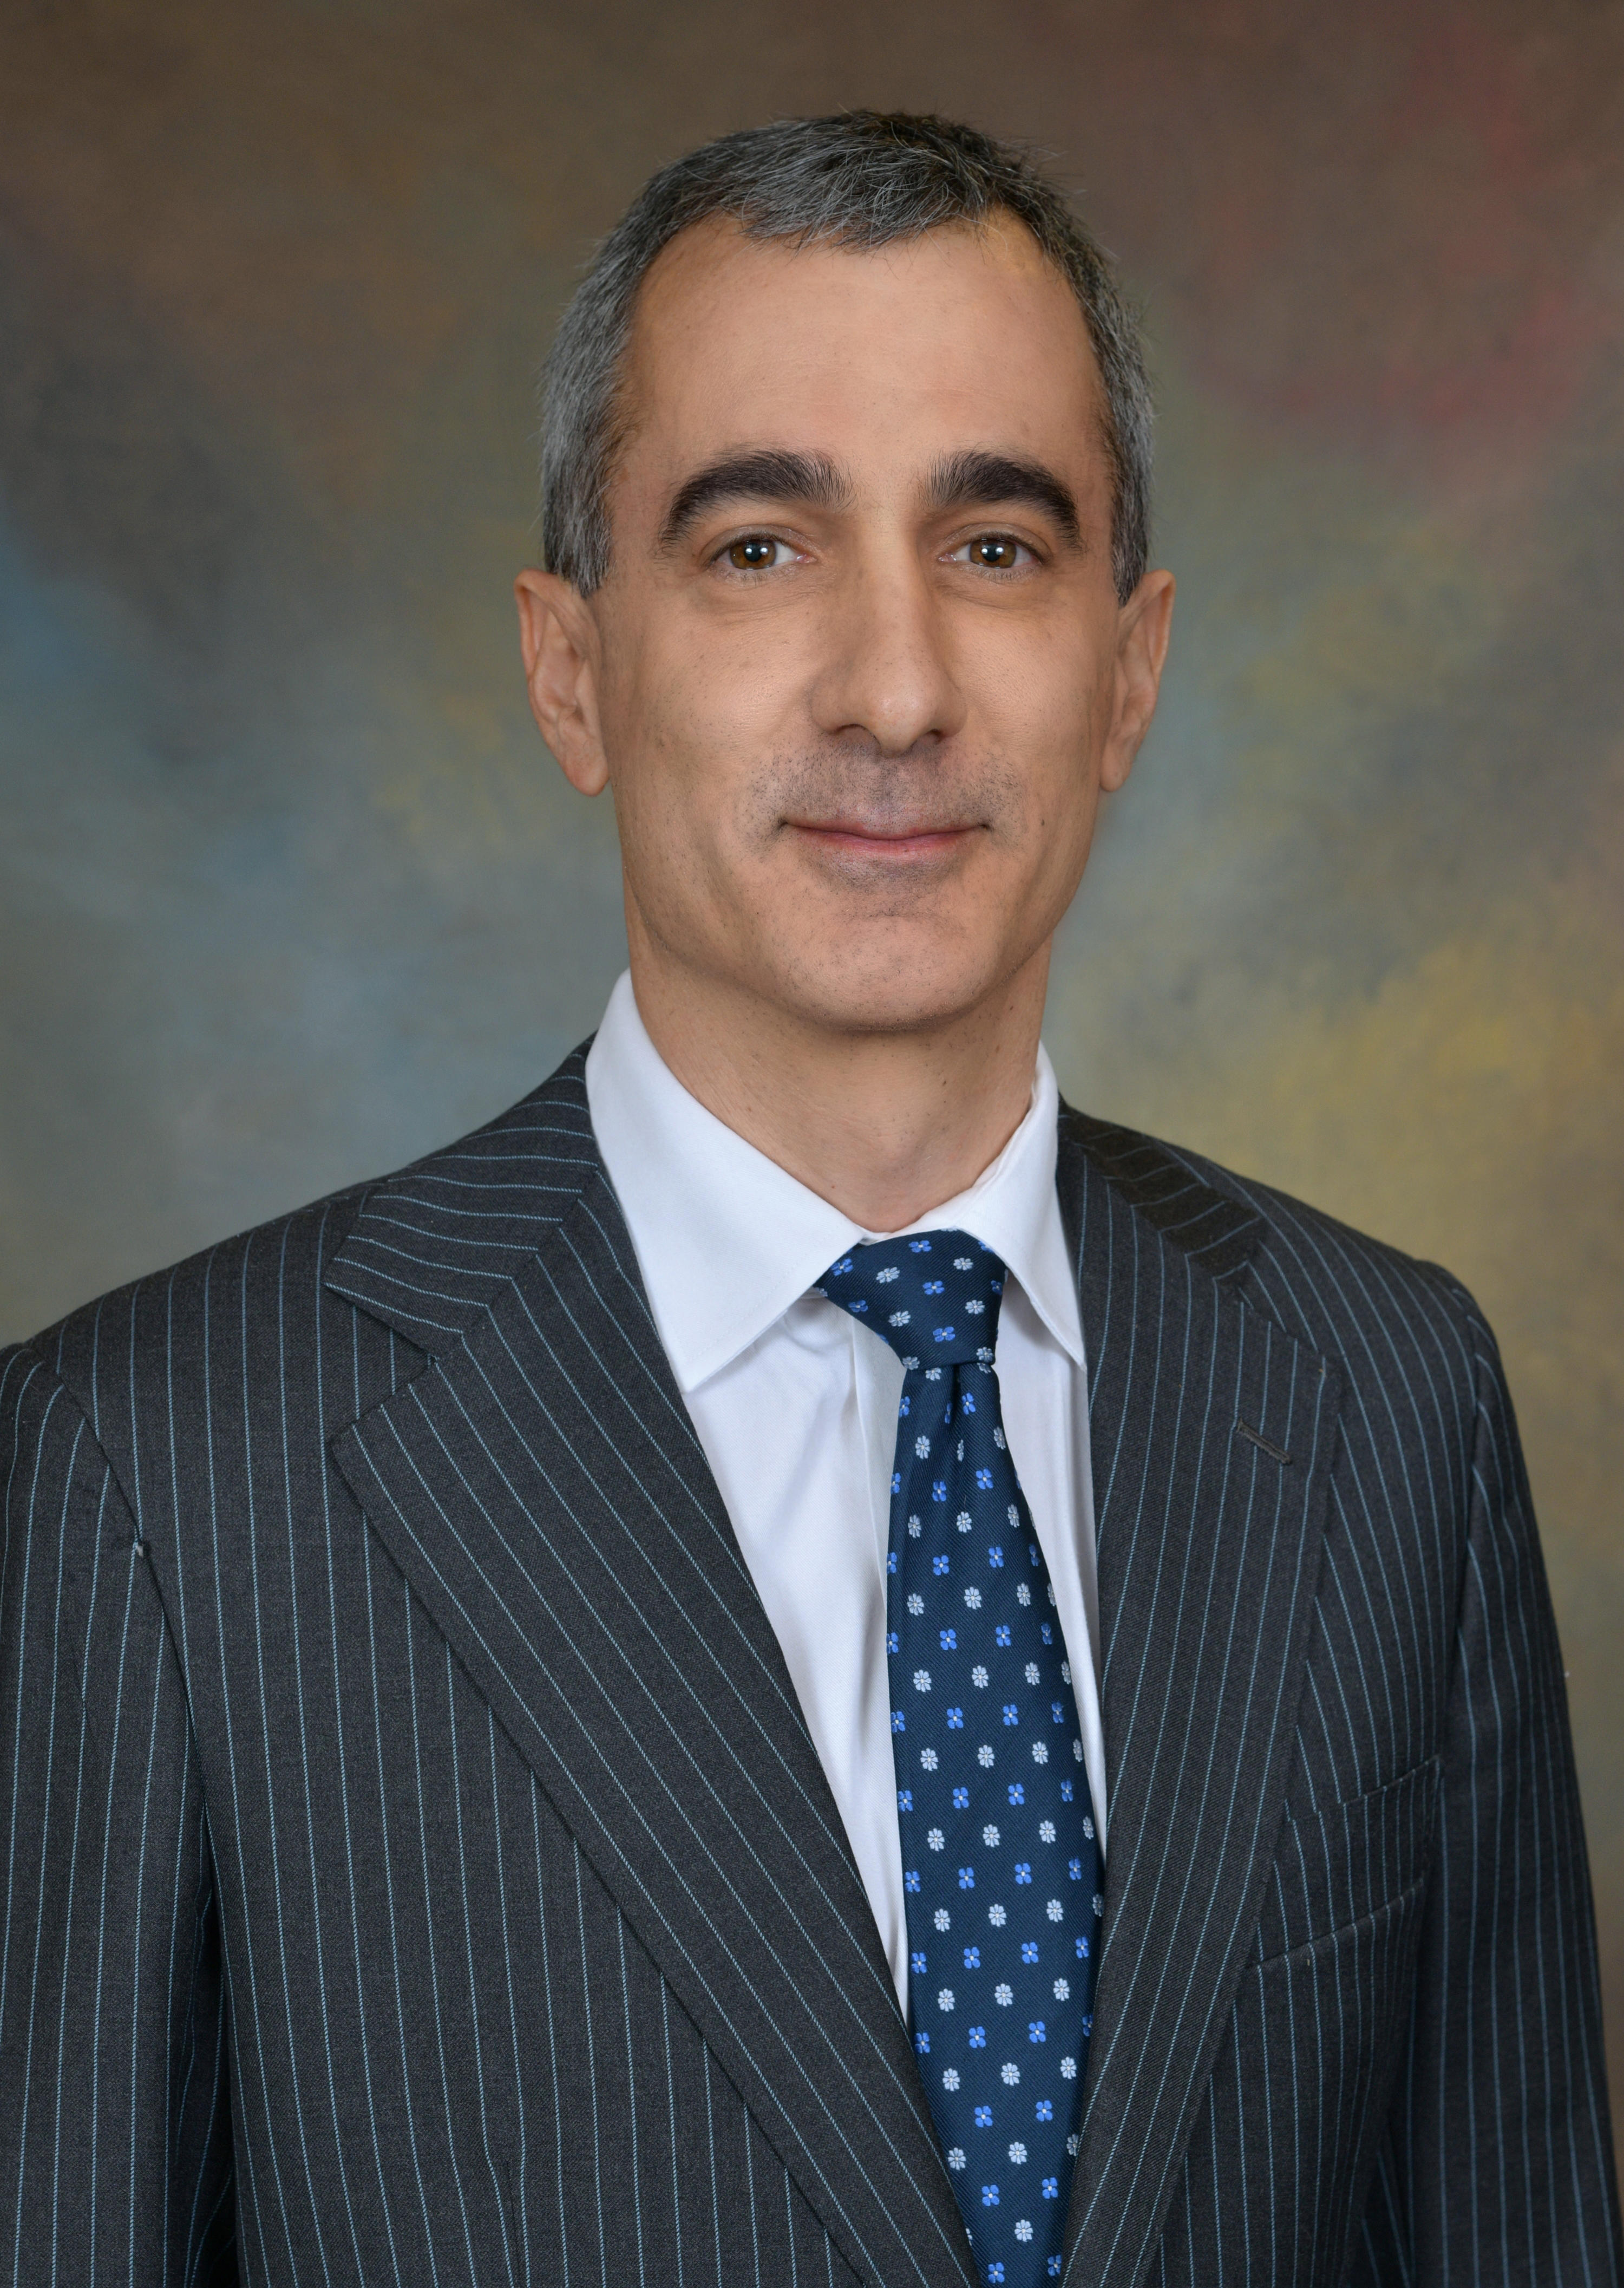 Francesco Santoni-Rugiu